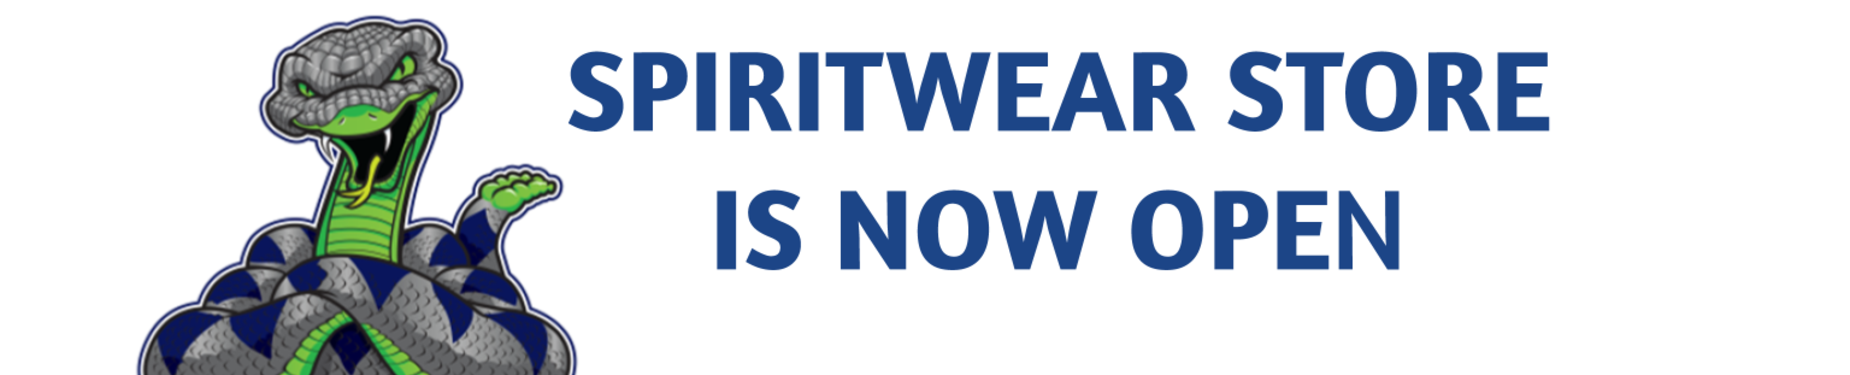 Spiritwear Store Open